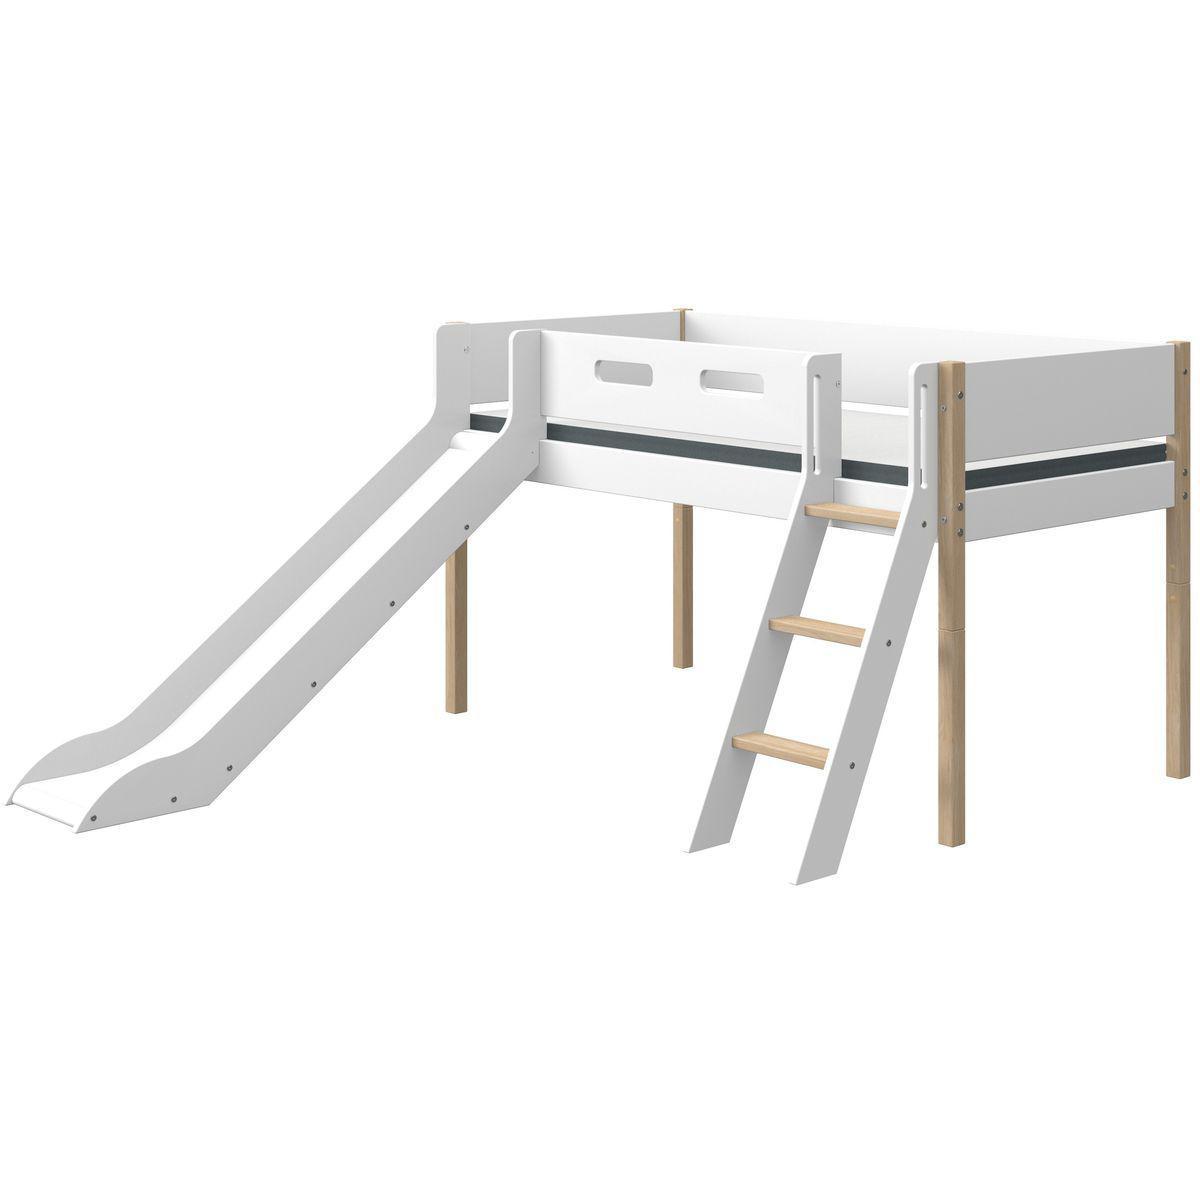 Cama media alta 90x200cm escalera inclinada-tobogán NOR Flexa roble-blanco